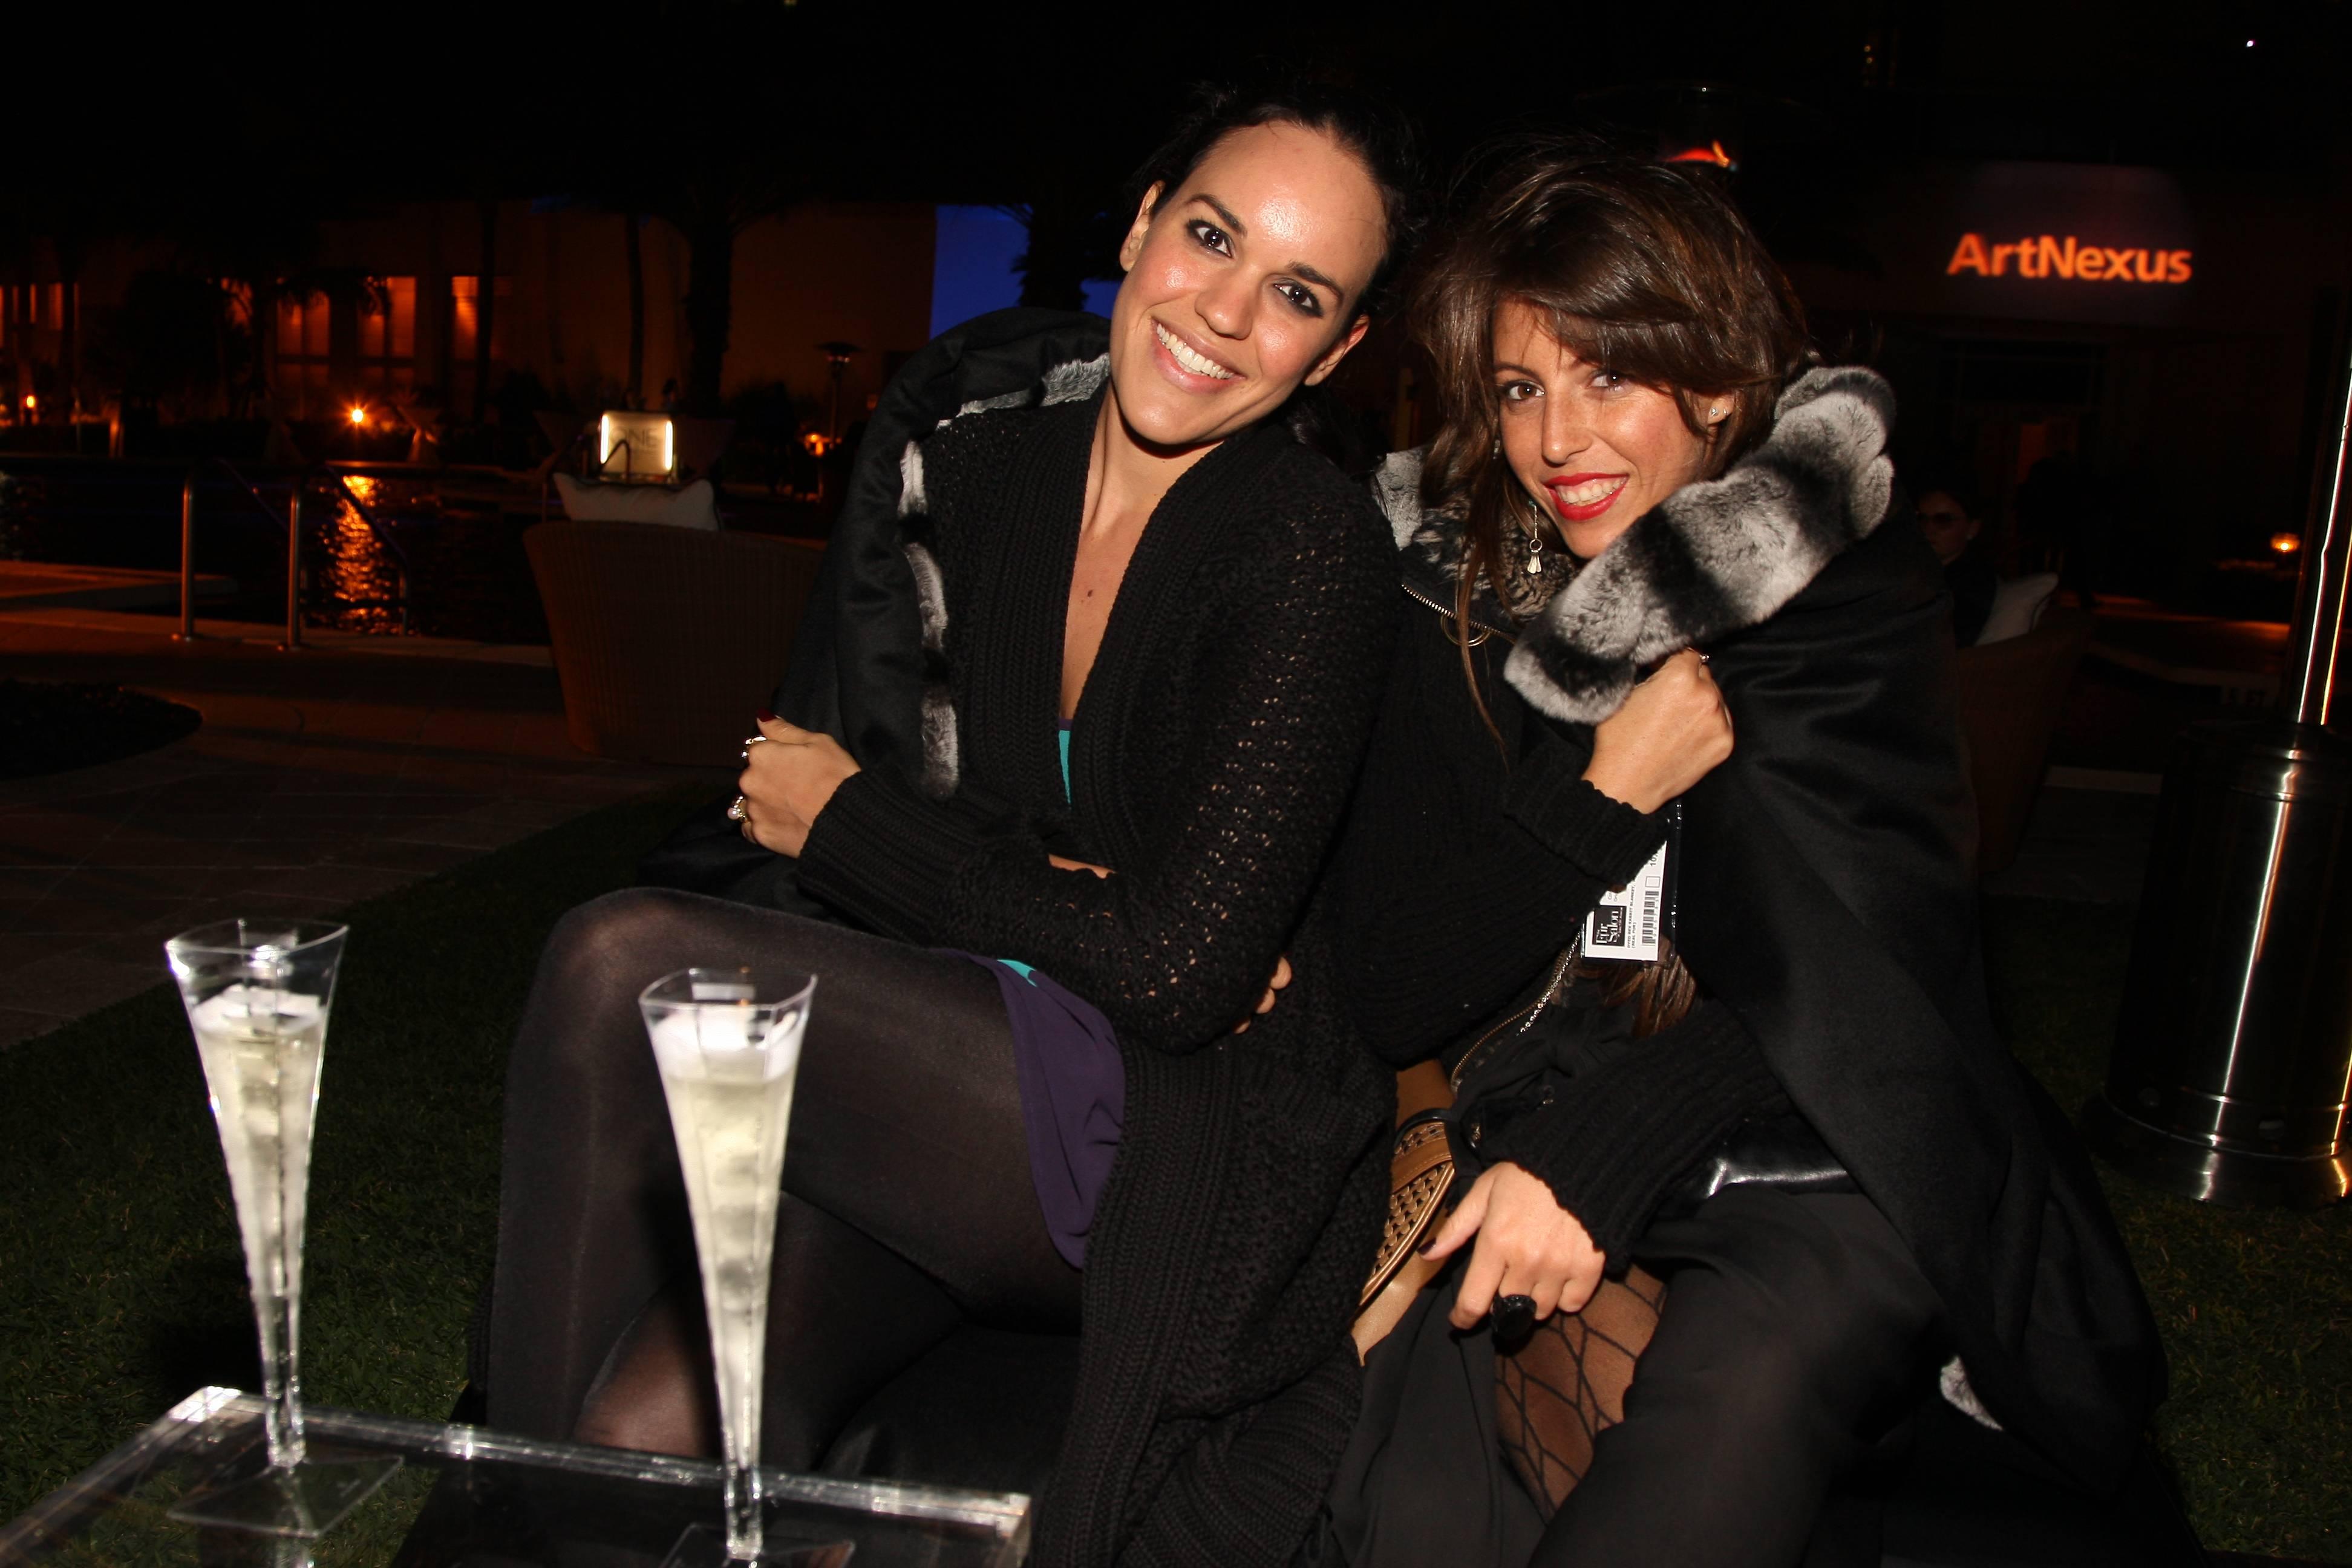 Daniela Frewa, Melanie Levi